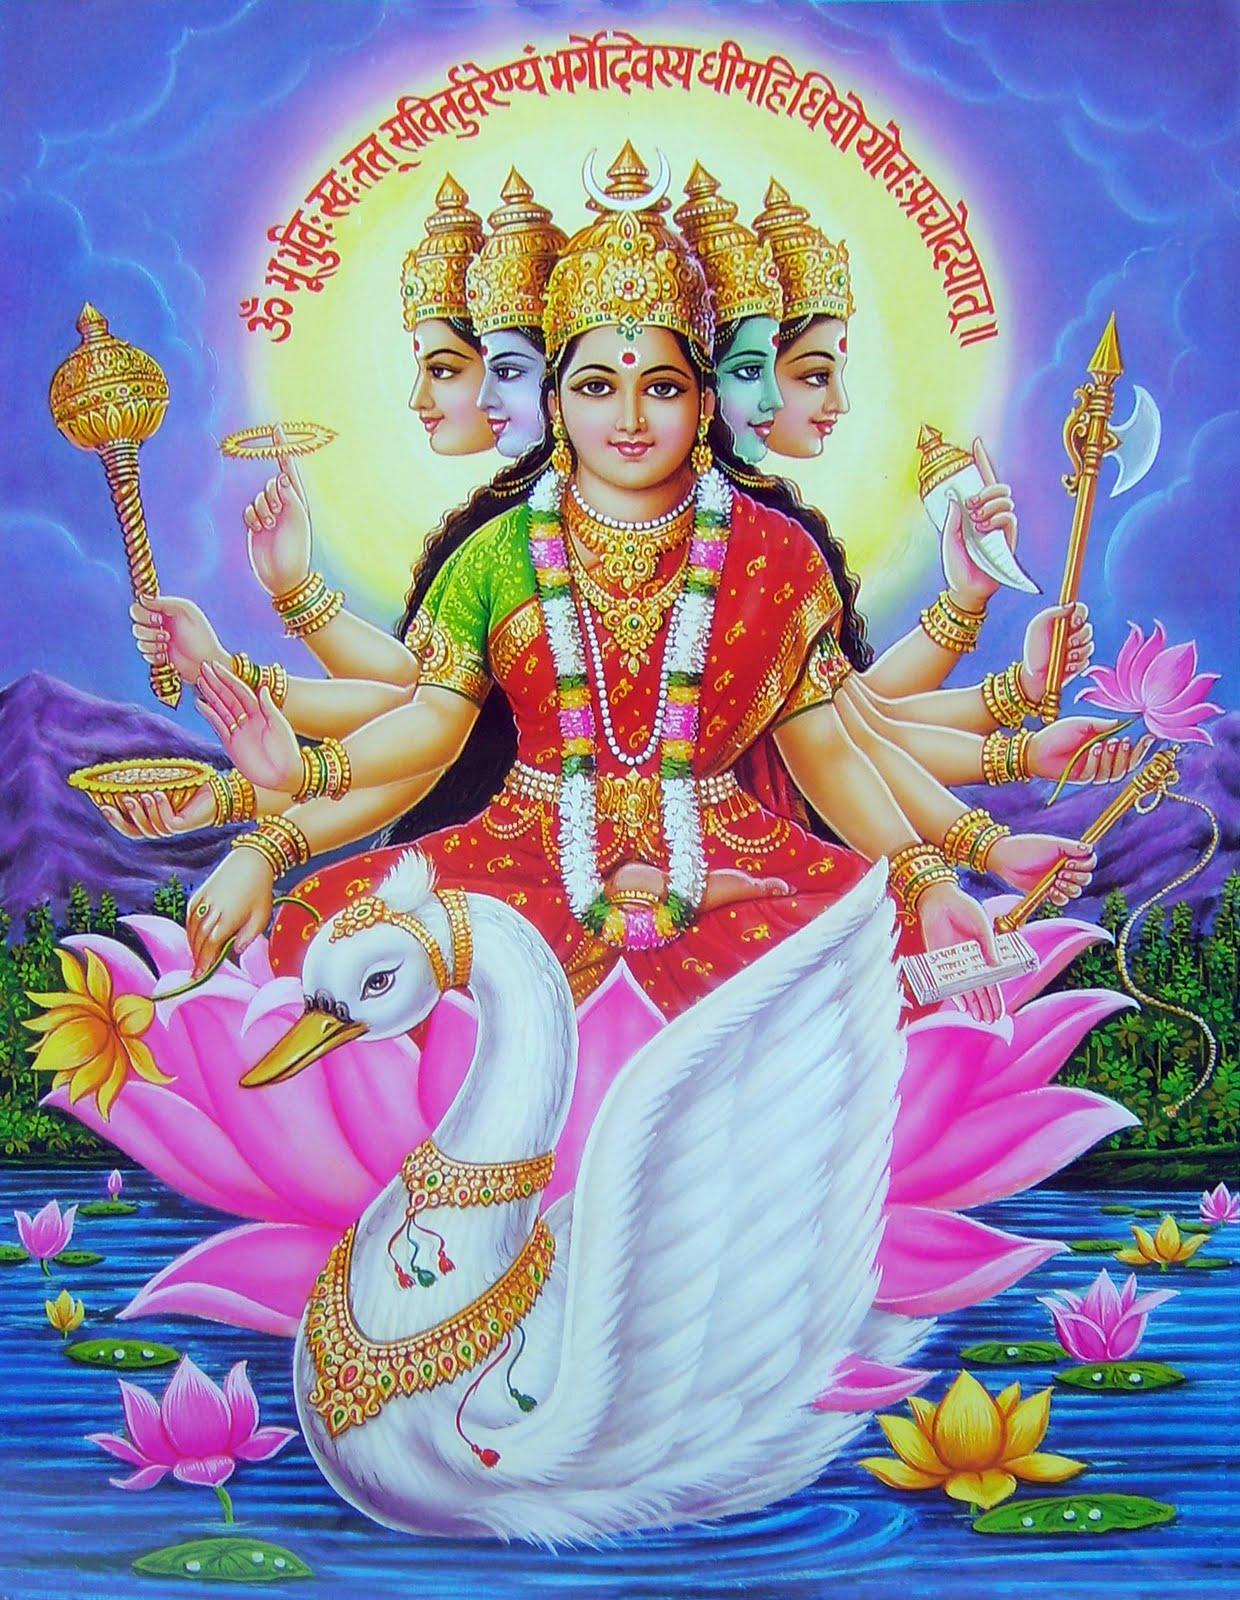 http://2.bp.blogspot.com/_GkuQDScRKGc/TEQWo9r413I/AAAAAAAAHYE/mTjzPva38CI/s1600/Goddess+Gayatri+Maa+Photo.jpg